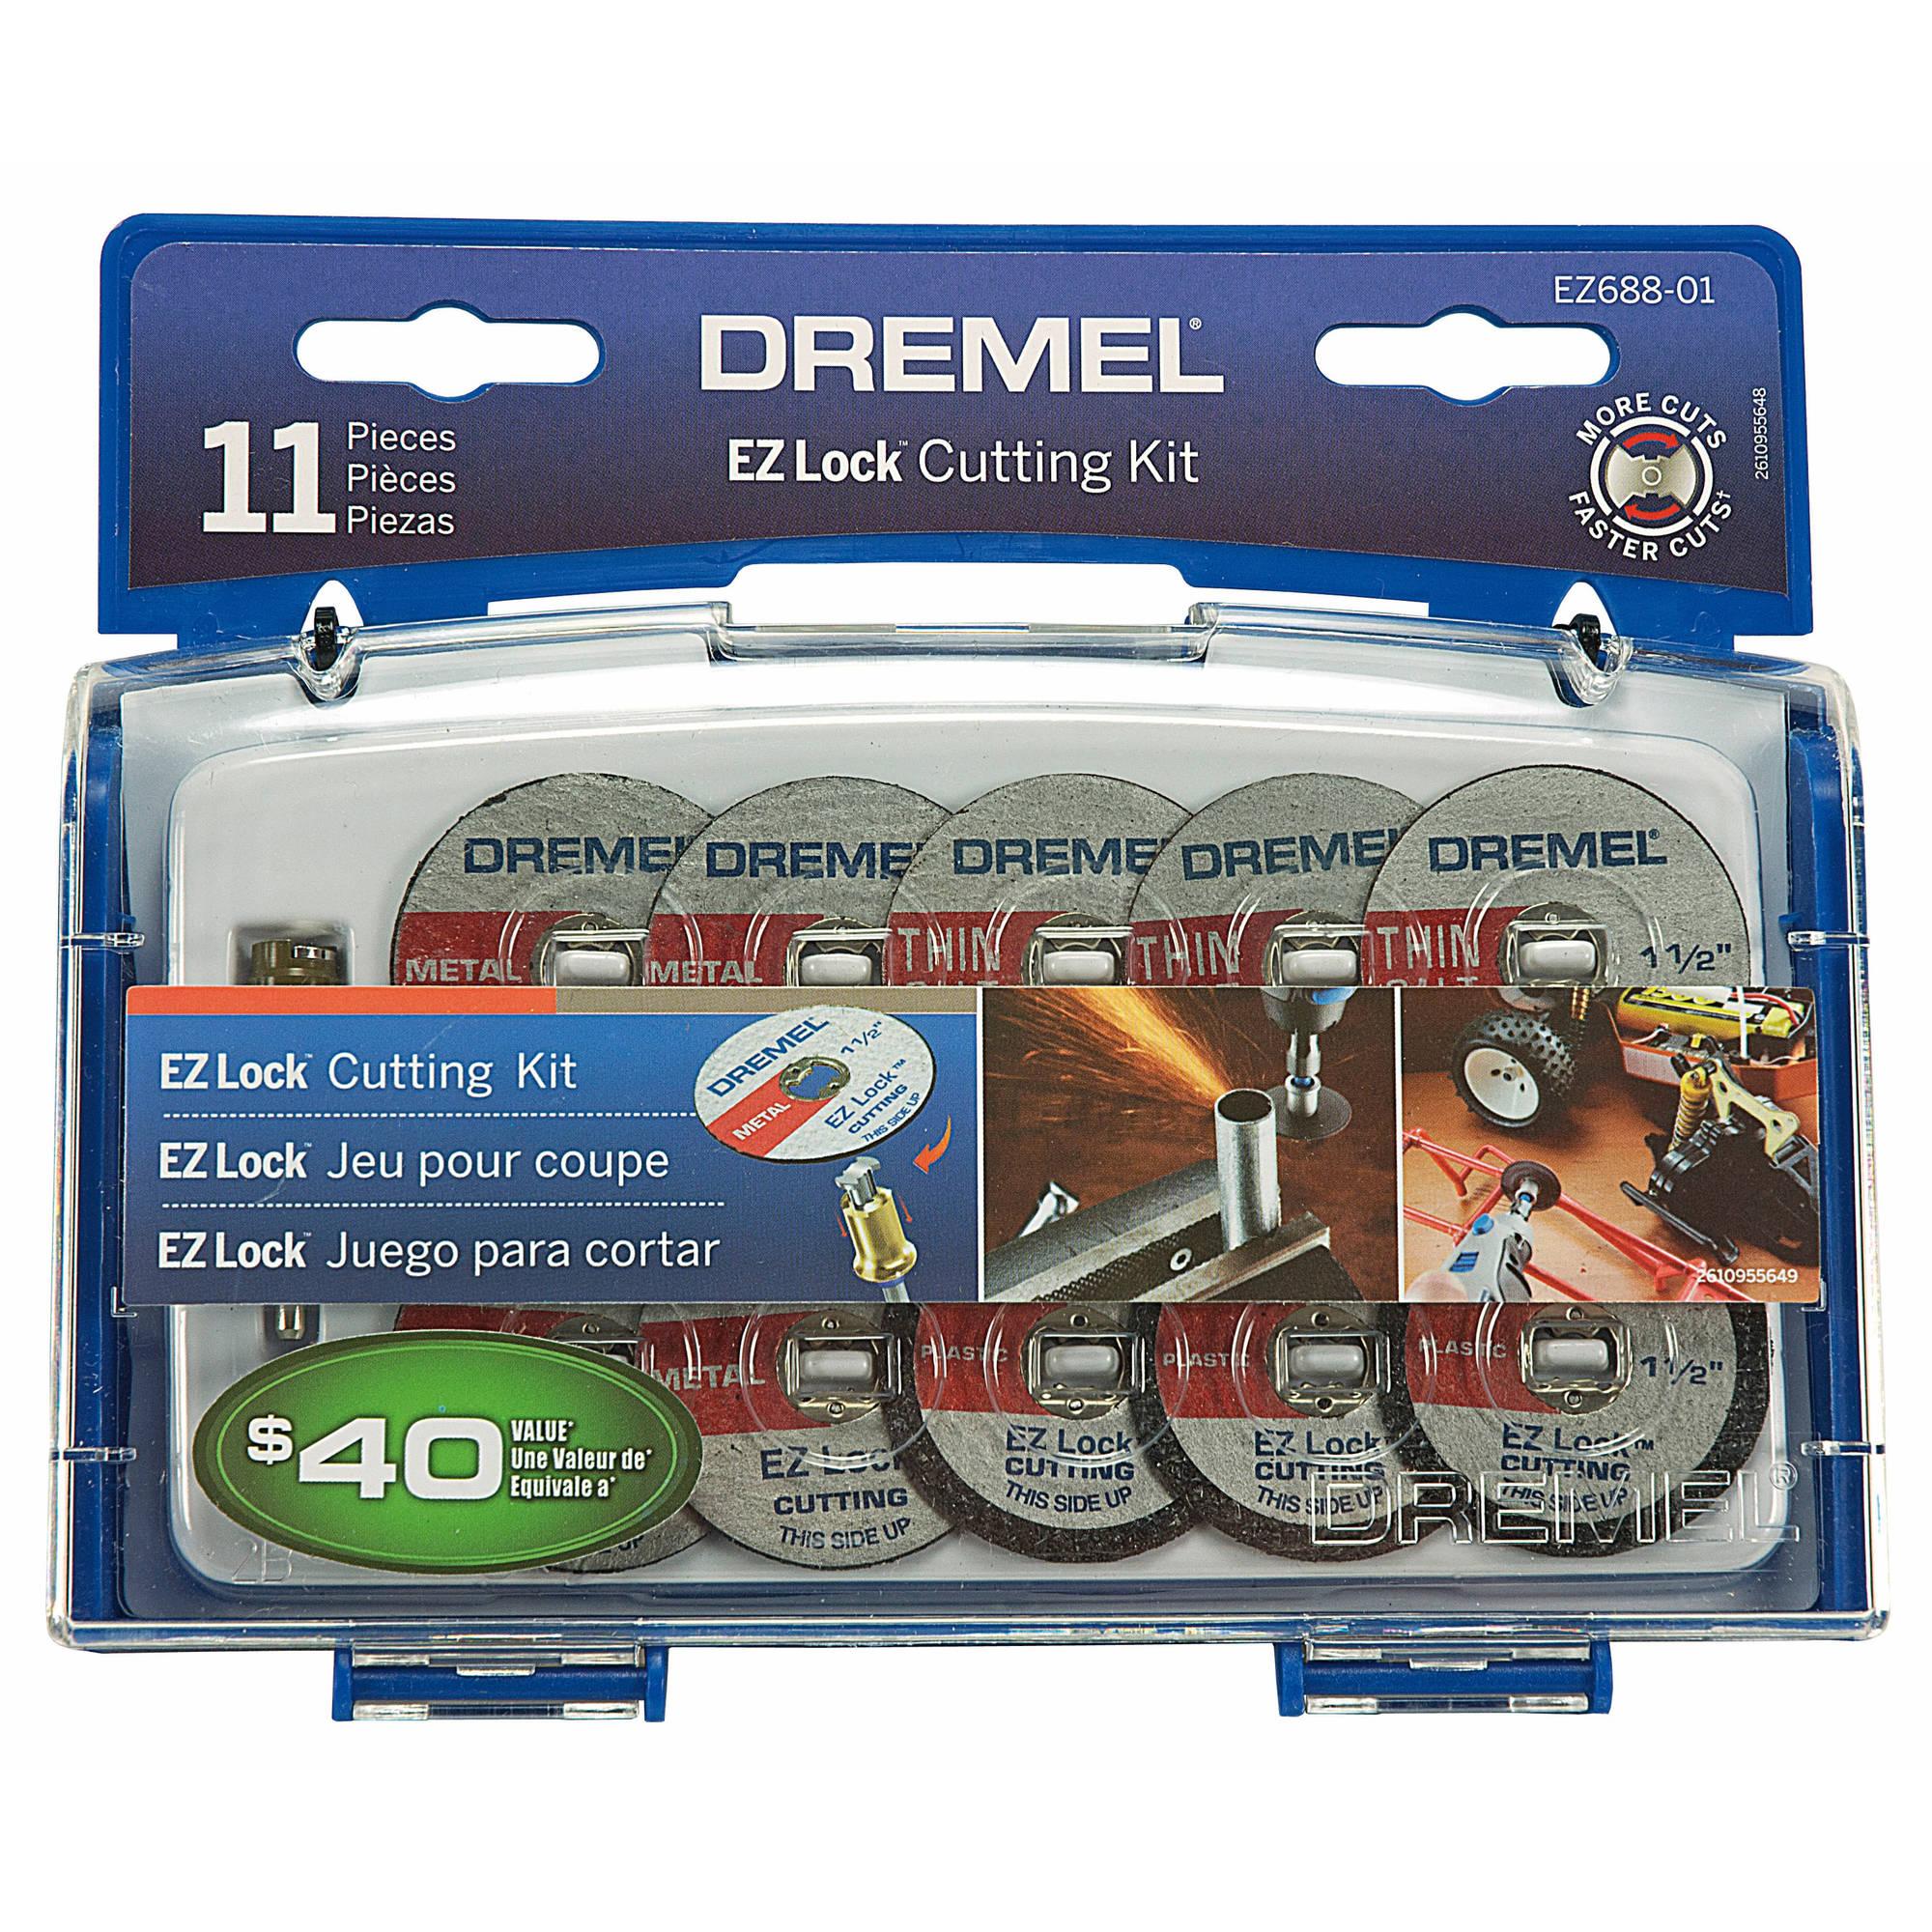 11-Piece Dremel EZ688-03 Rotary Tool EZ Lock Cutting Kit